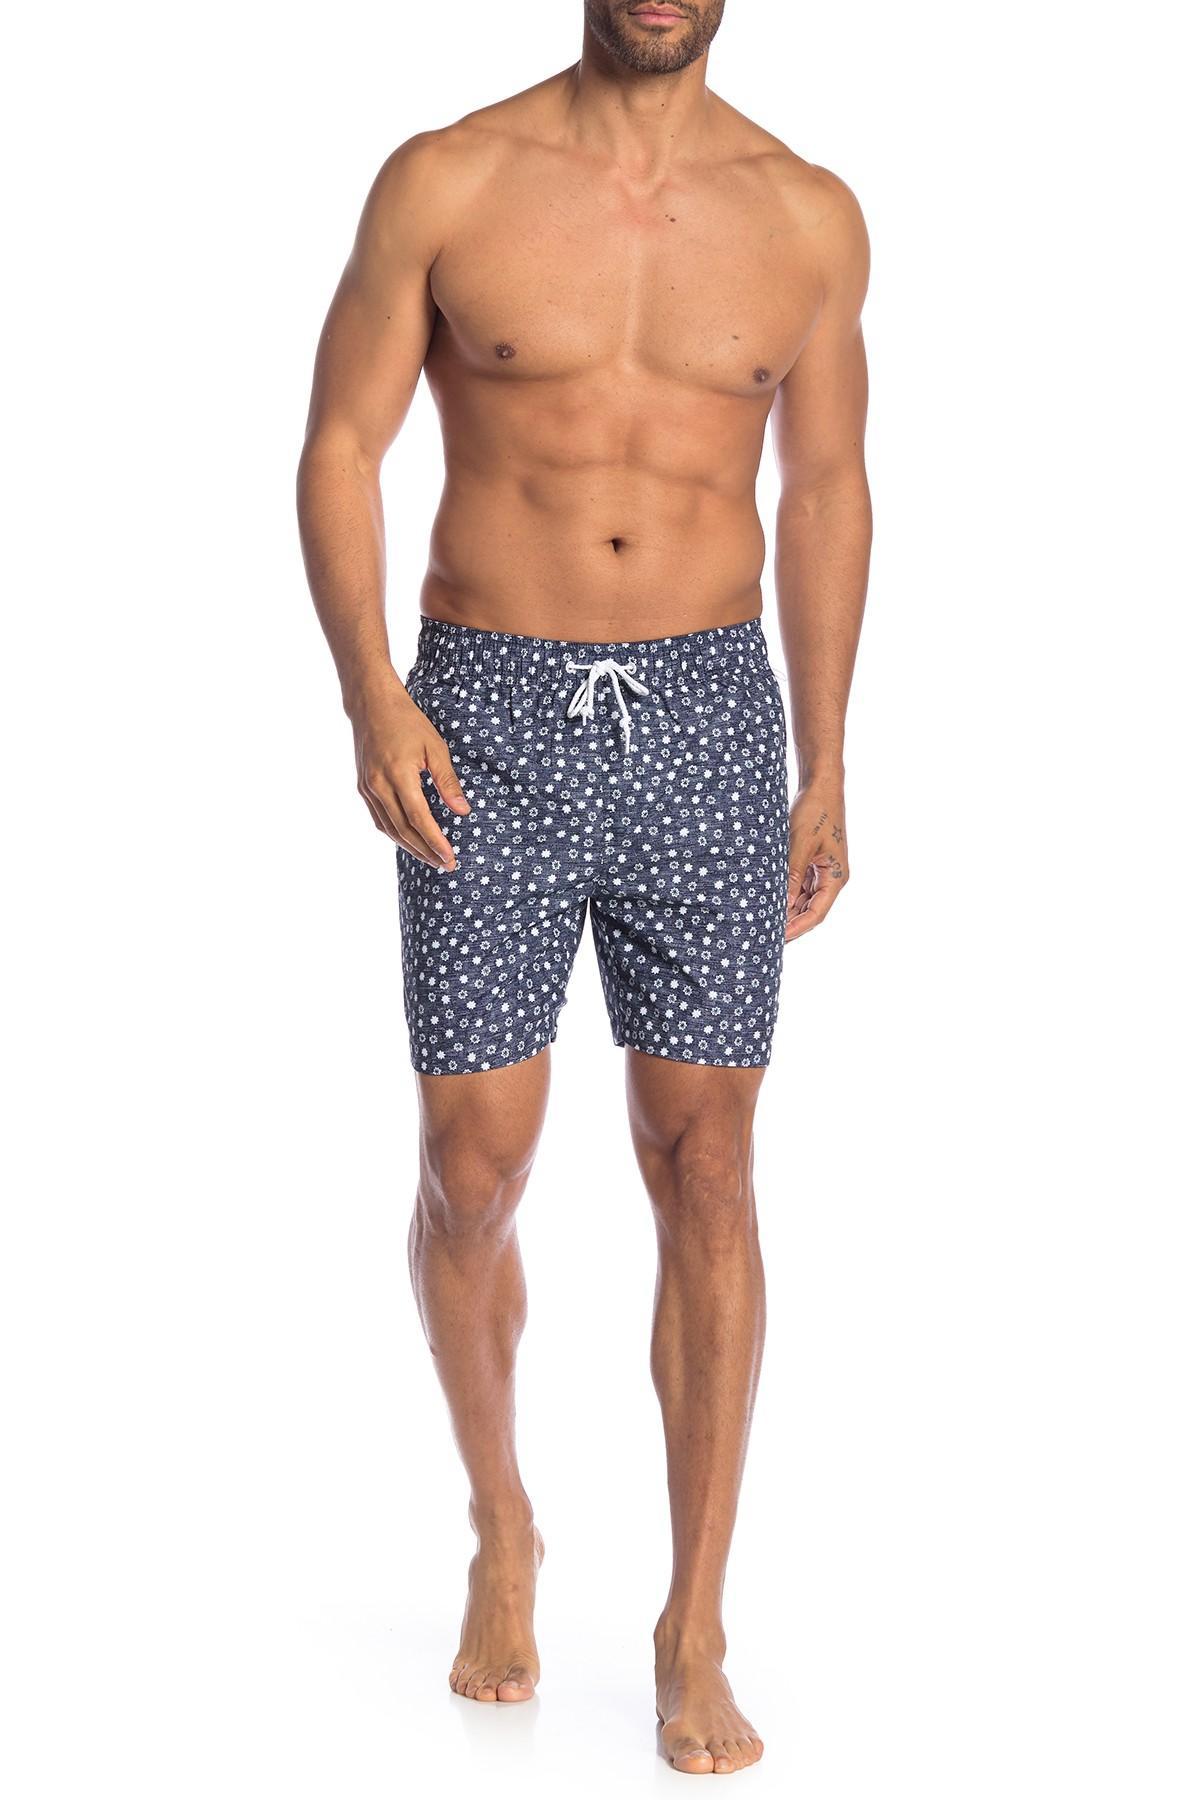 Silver Snowflakes Paper Holidays Mens Drawstring Elastic Waist Surfing Beach Board Shorts with Pockets